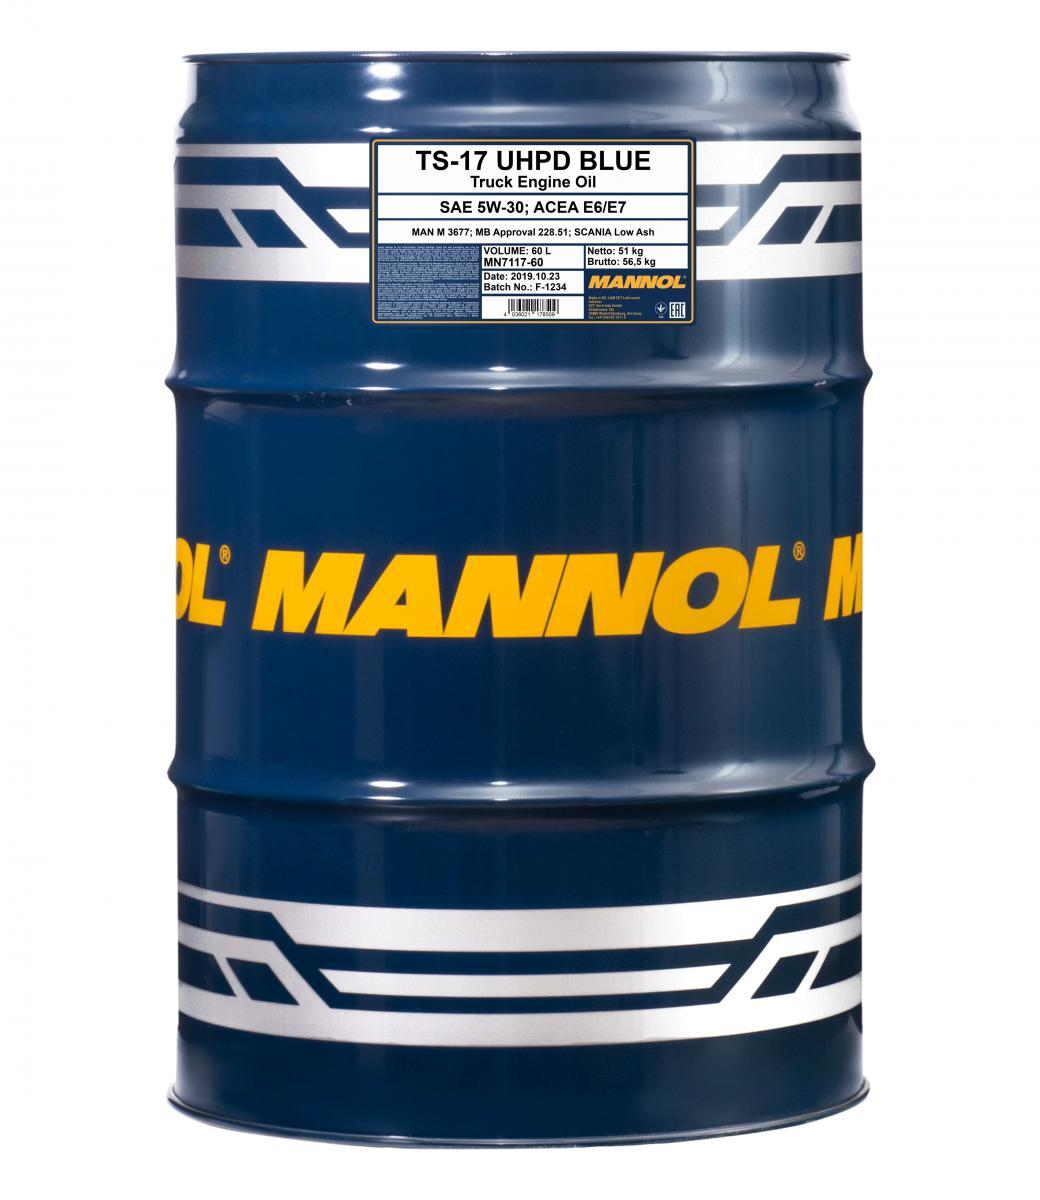 MN7117-60 MANNOL TS-17, UHPD Blue 5W-30, 5W-30, 60l Motoröl MN7117-60 günstig kaufen